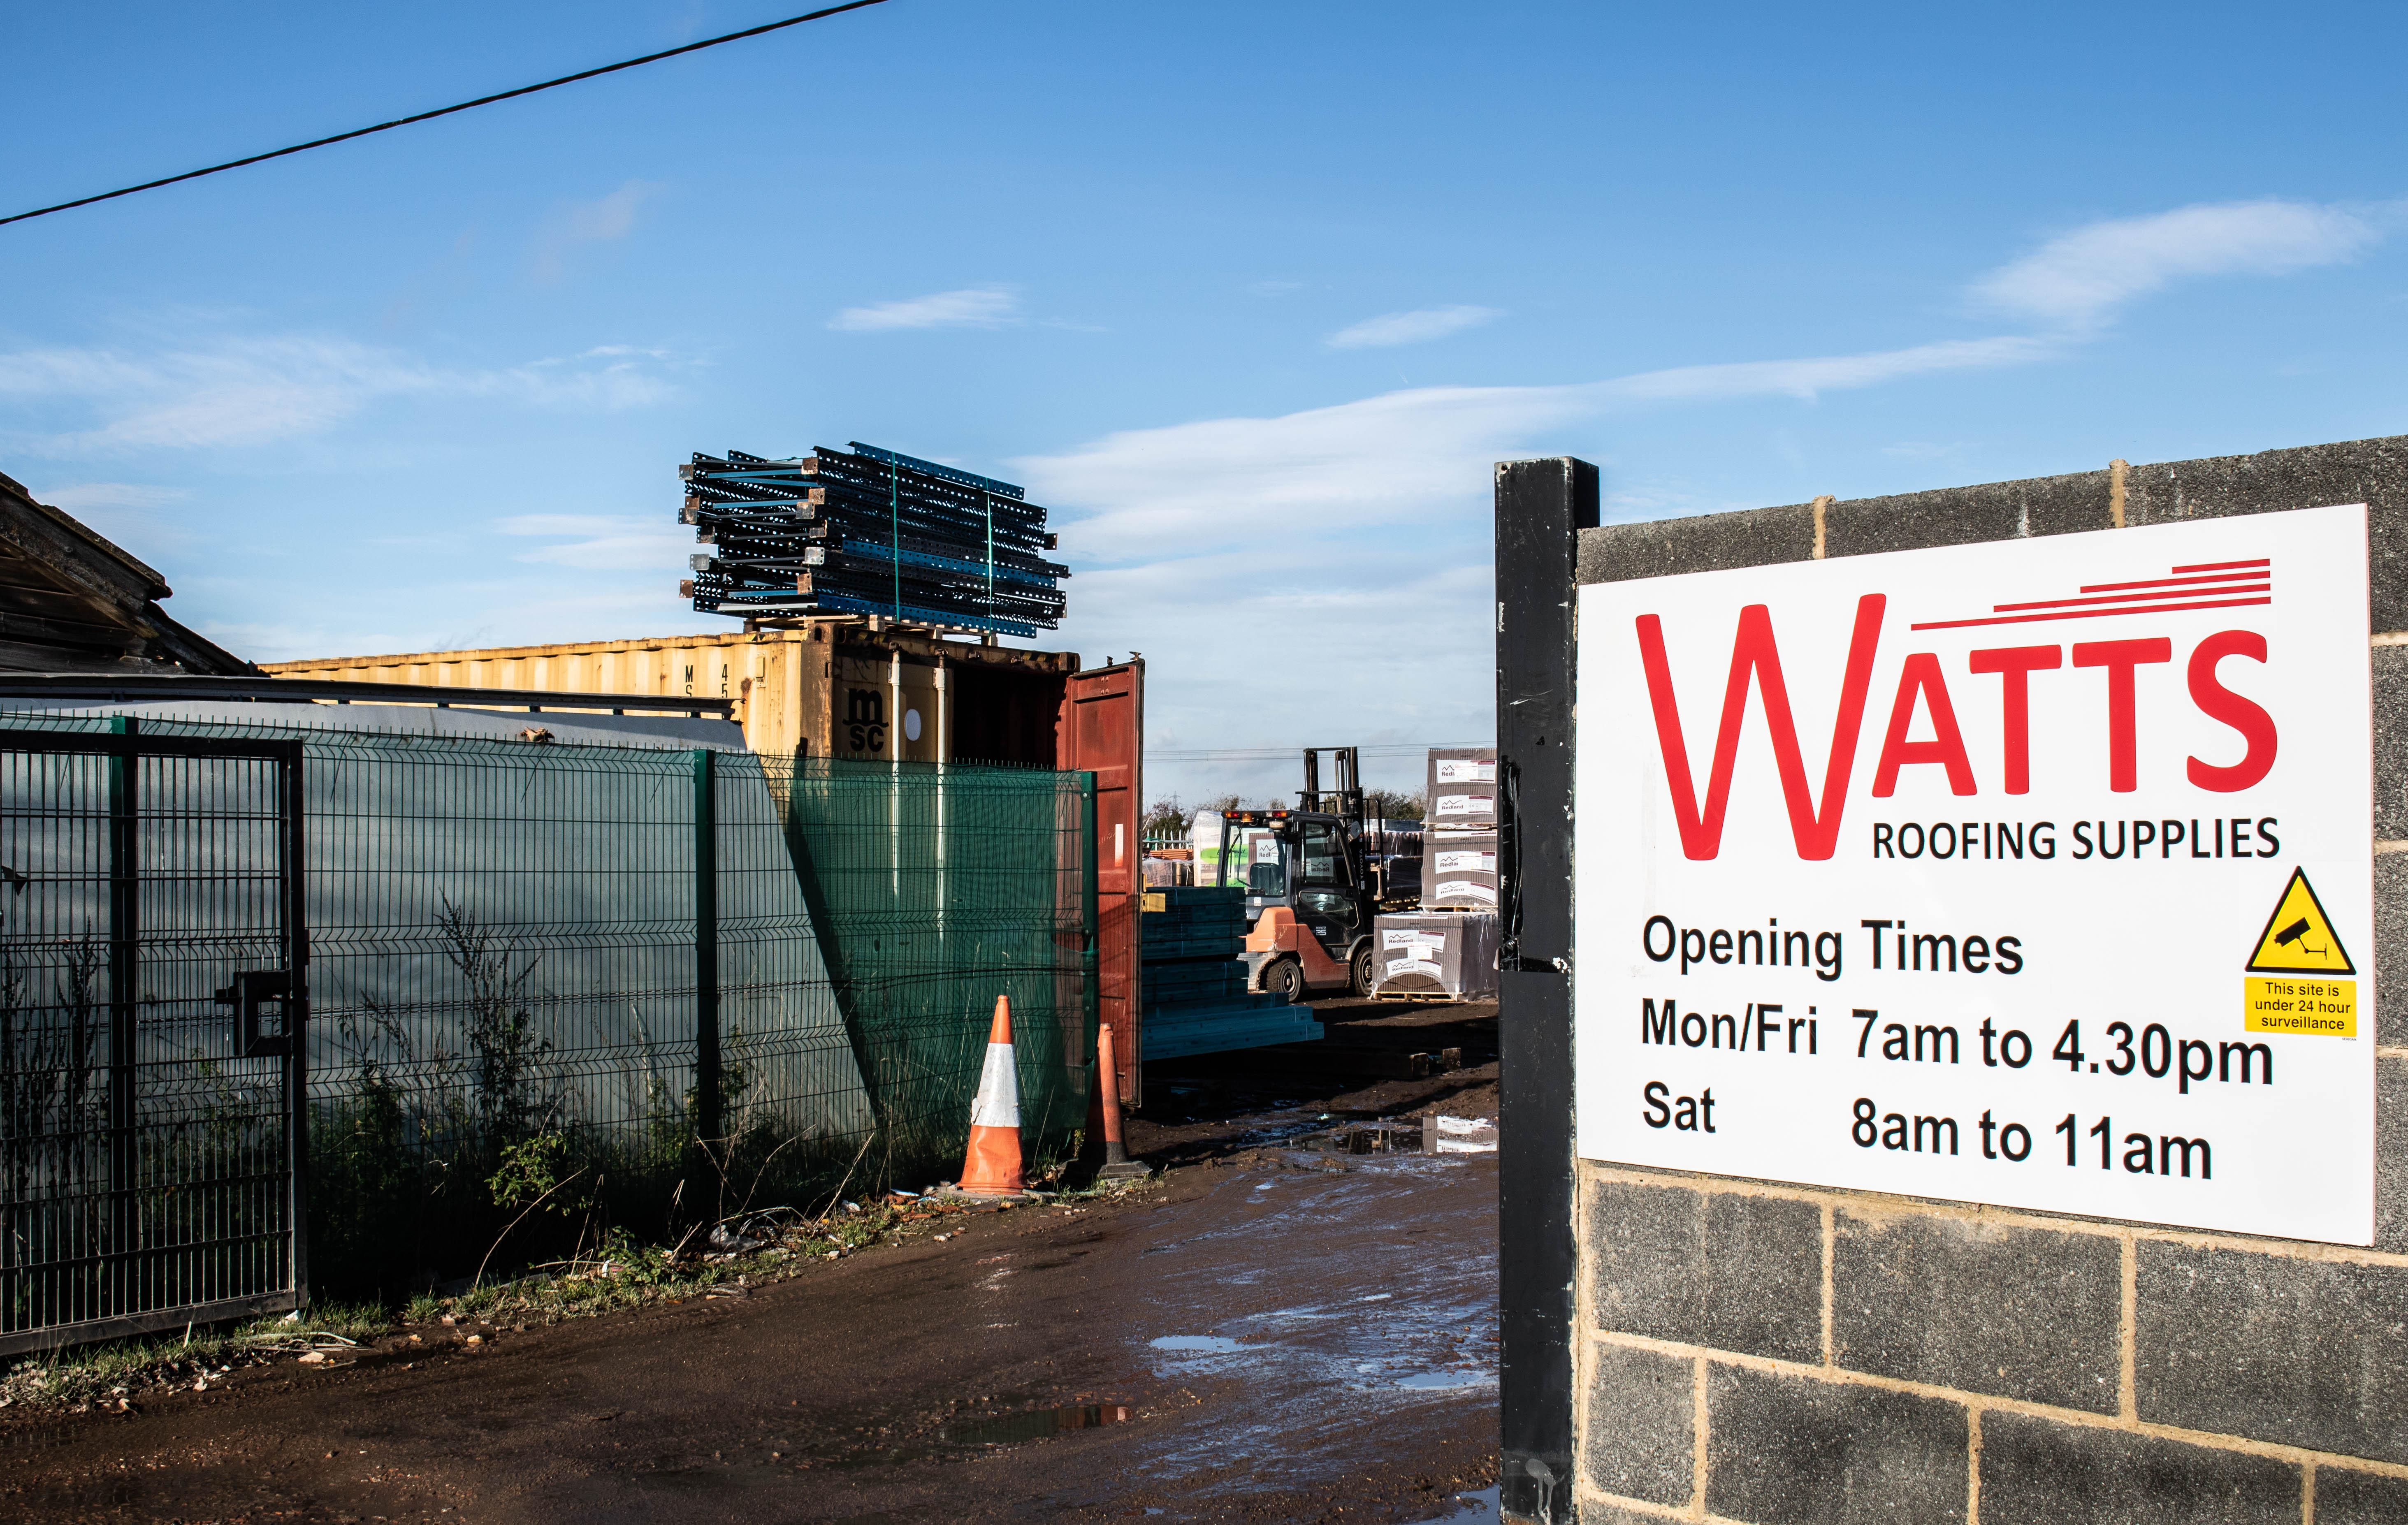 Baldock Branch - Watts Roofing Supplies